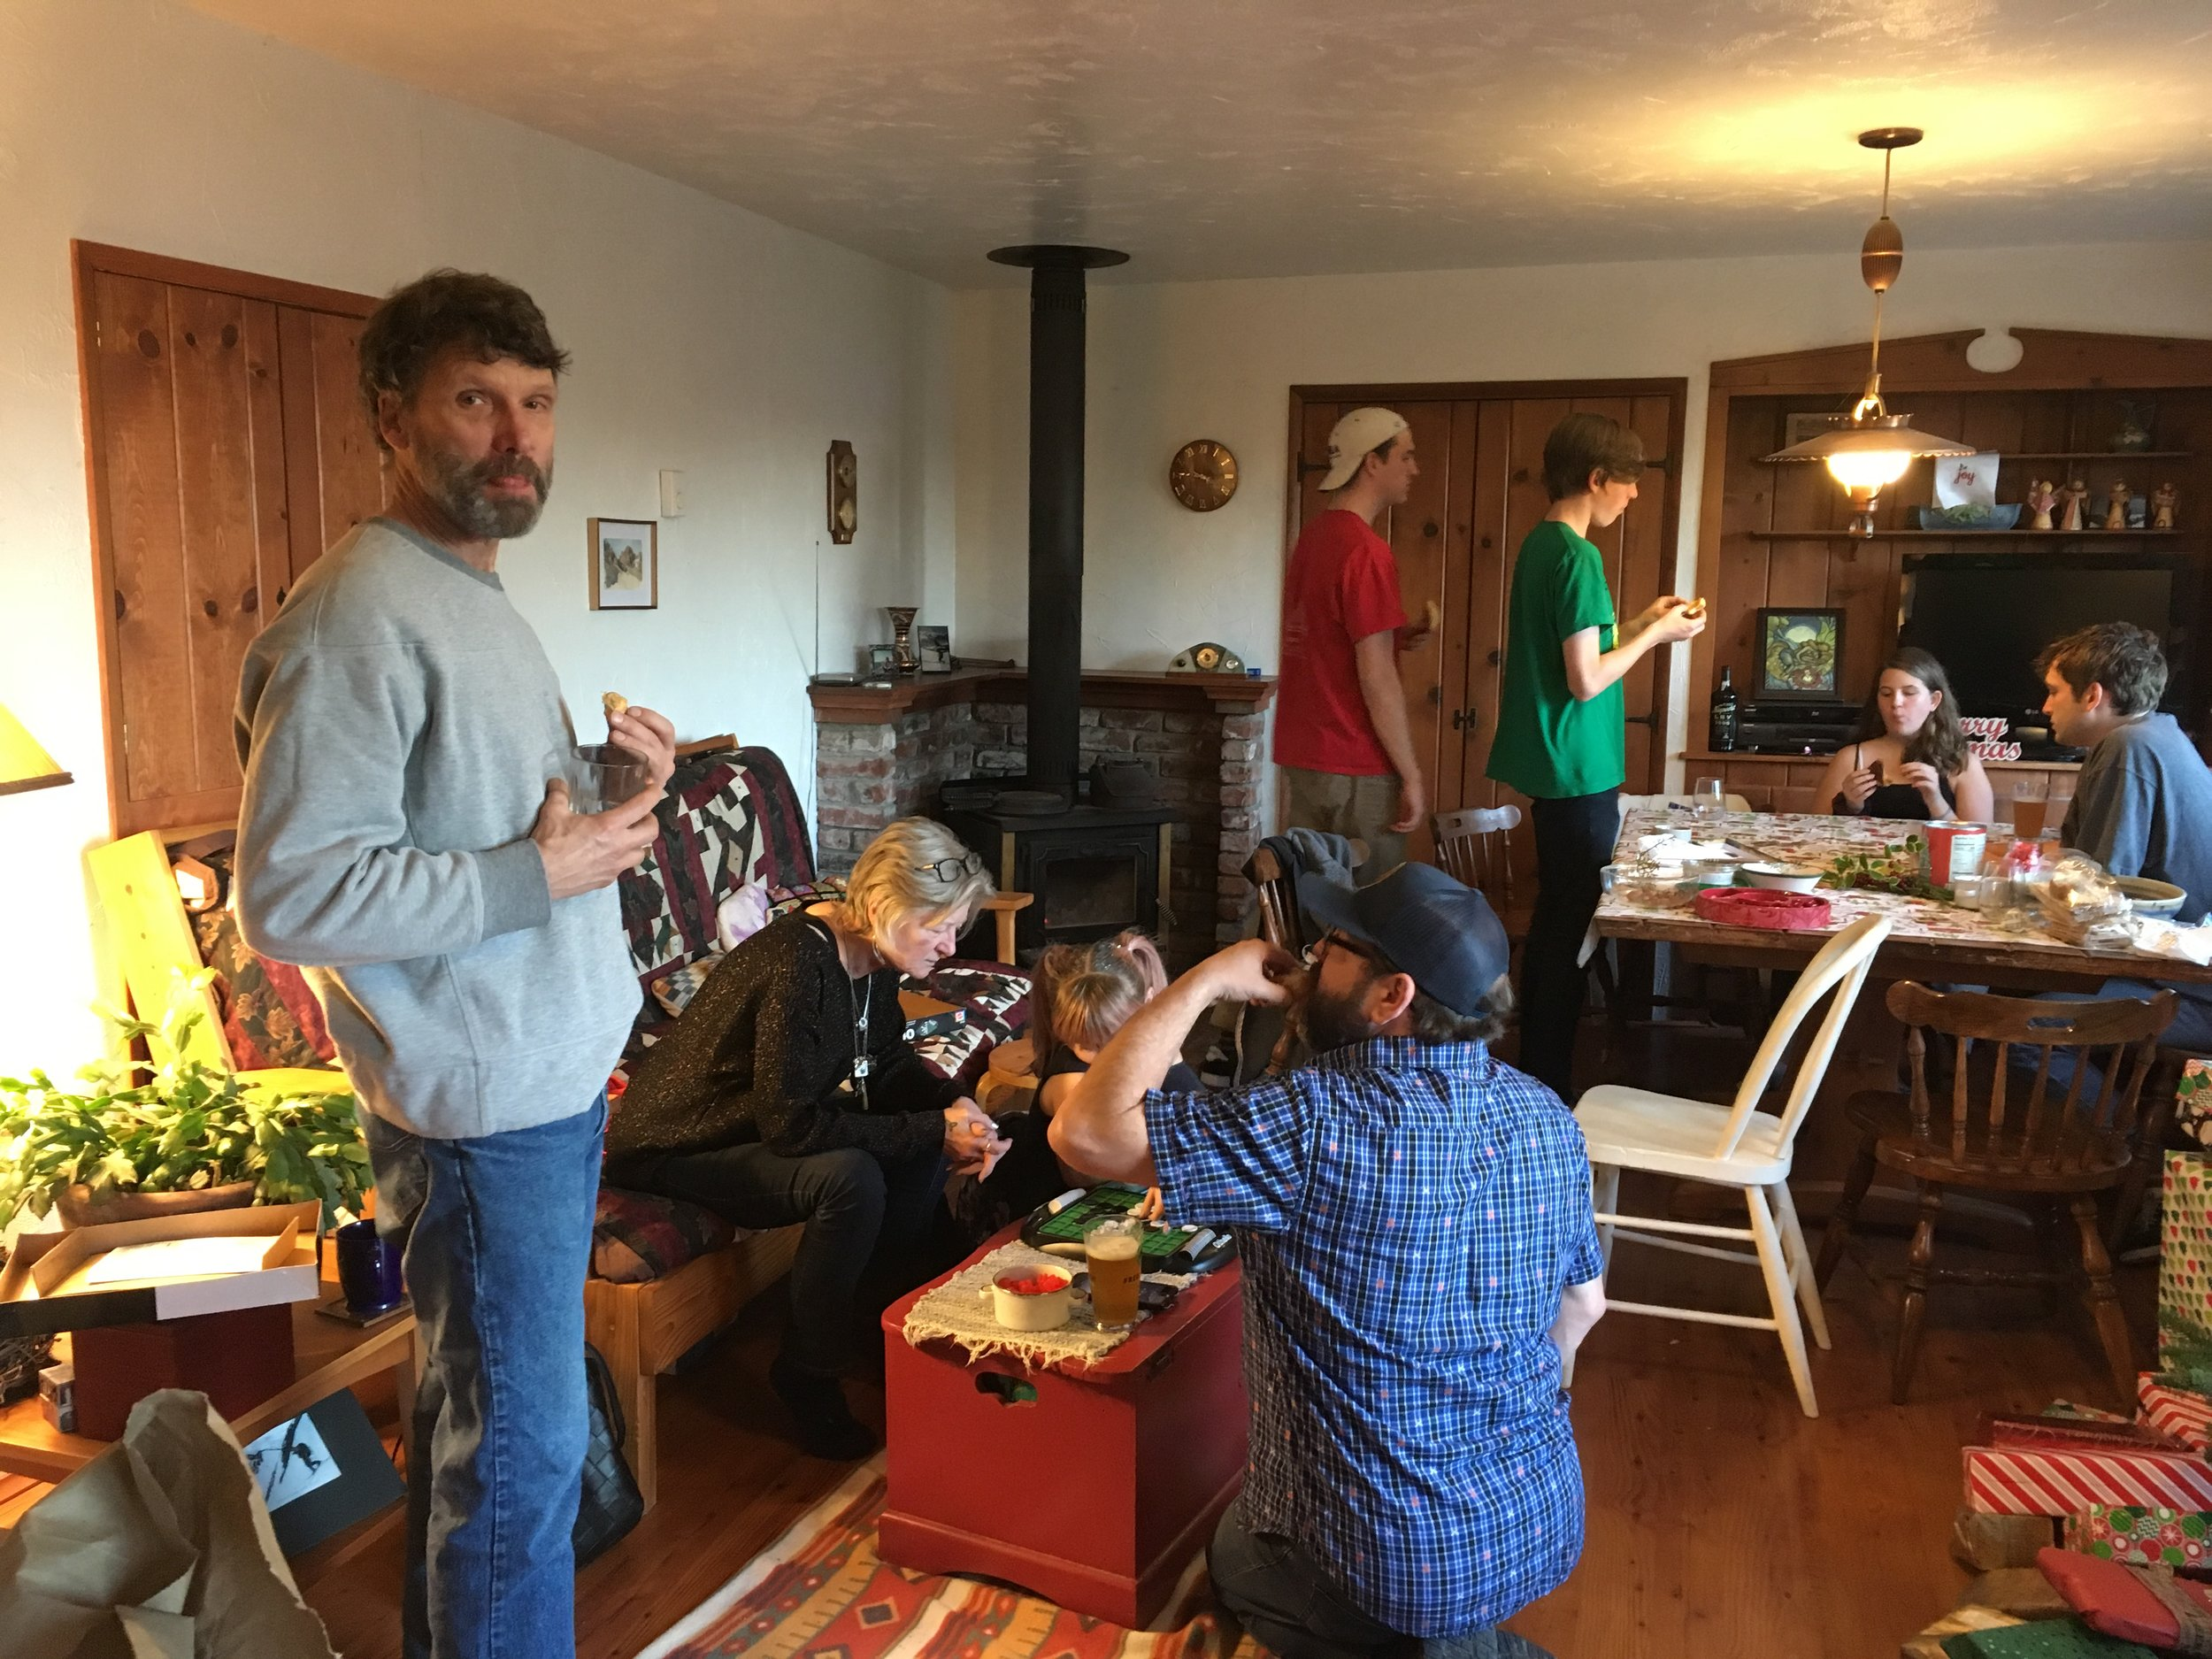 Scott Rampton, Karyne Pesho (Ron's friend), London (Karyne's granddaughter), Joel, Miles, Lucas, Carly, and Sam.